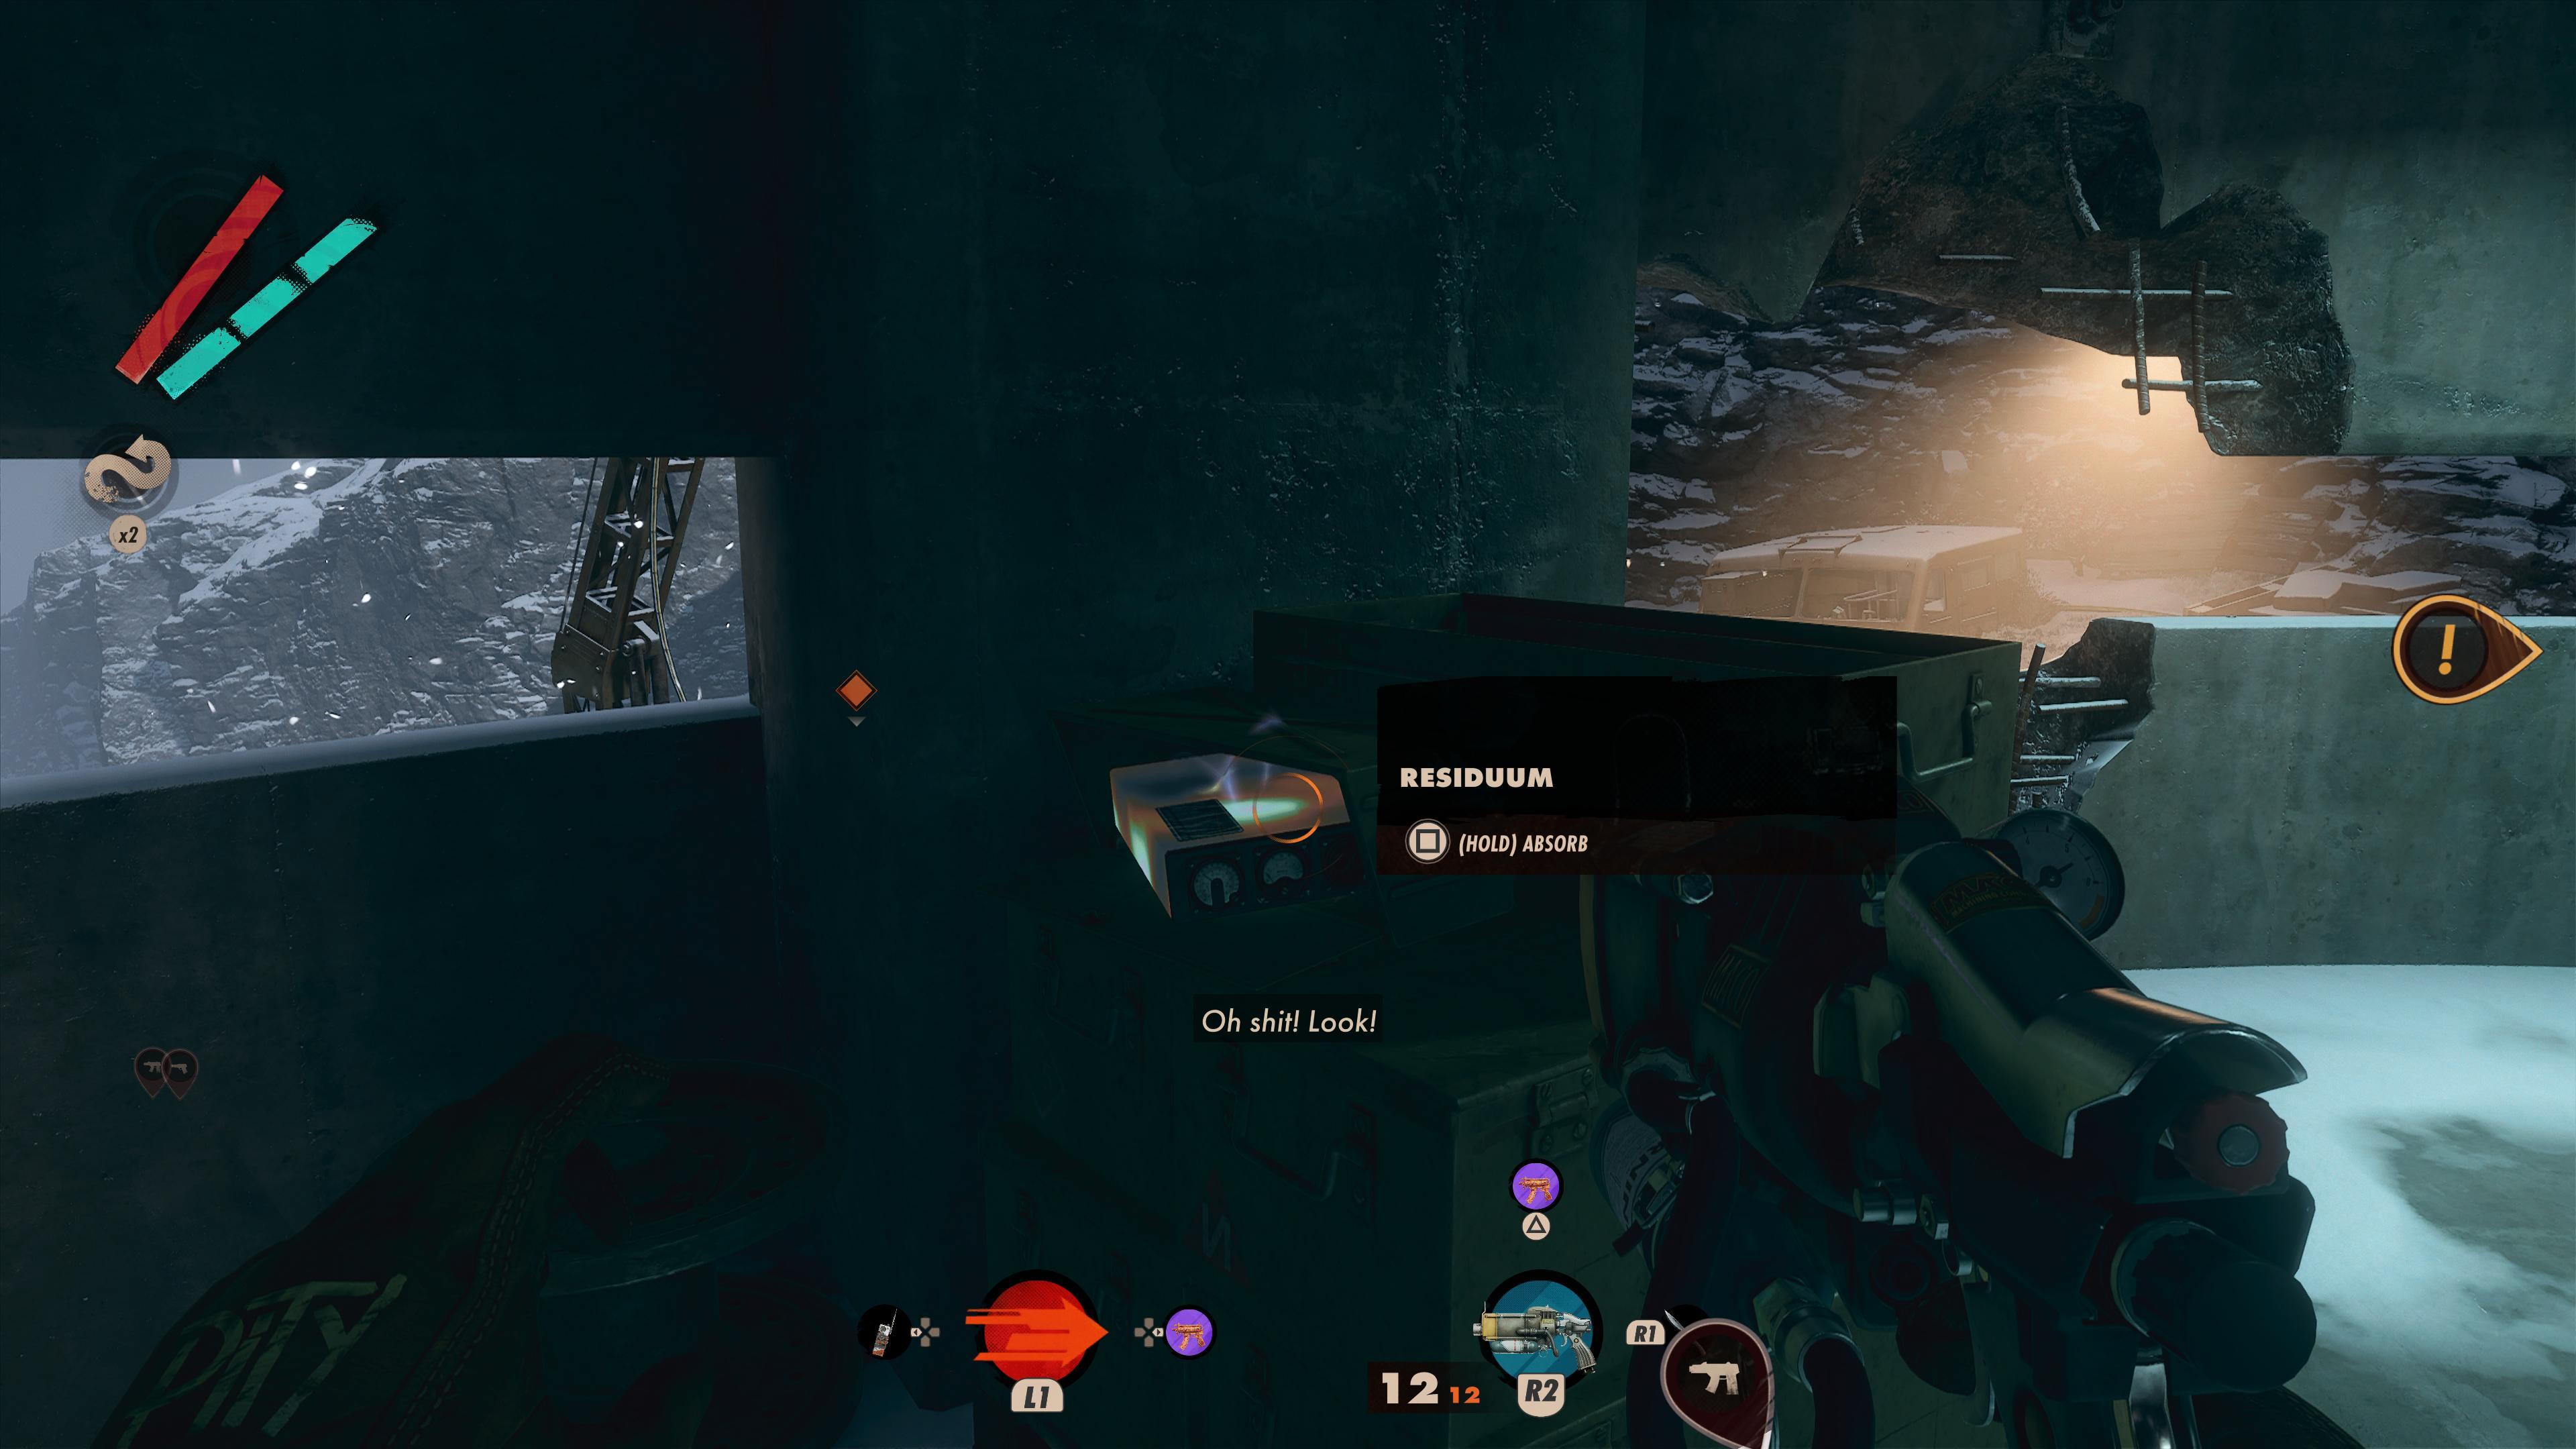 Deathloop glowing items use explained